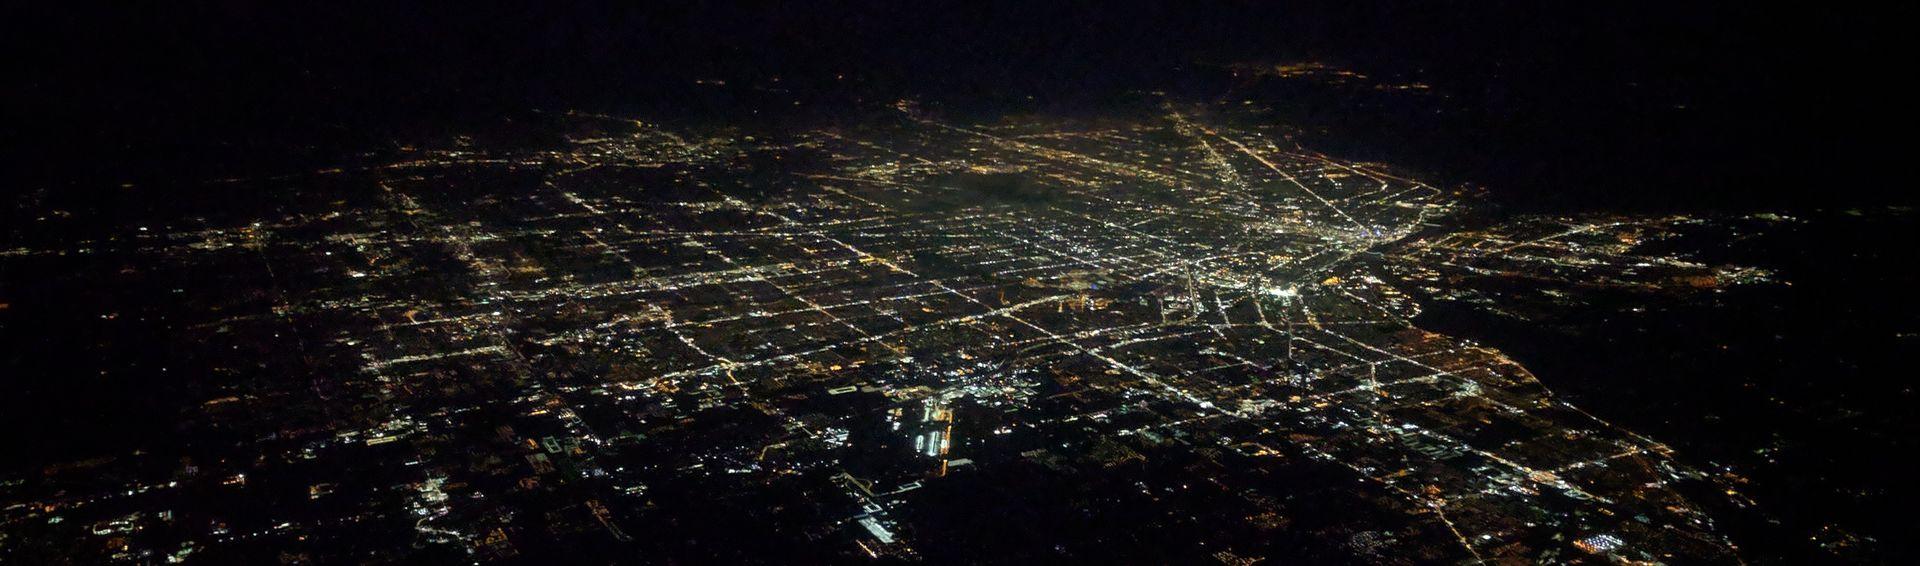 Фото умирающего Детройта в ночи с борта самолета